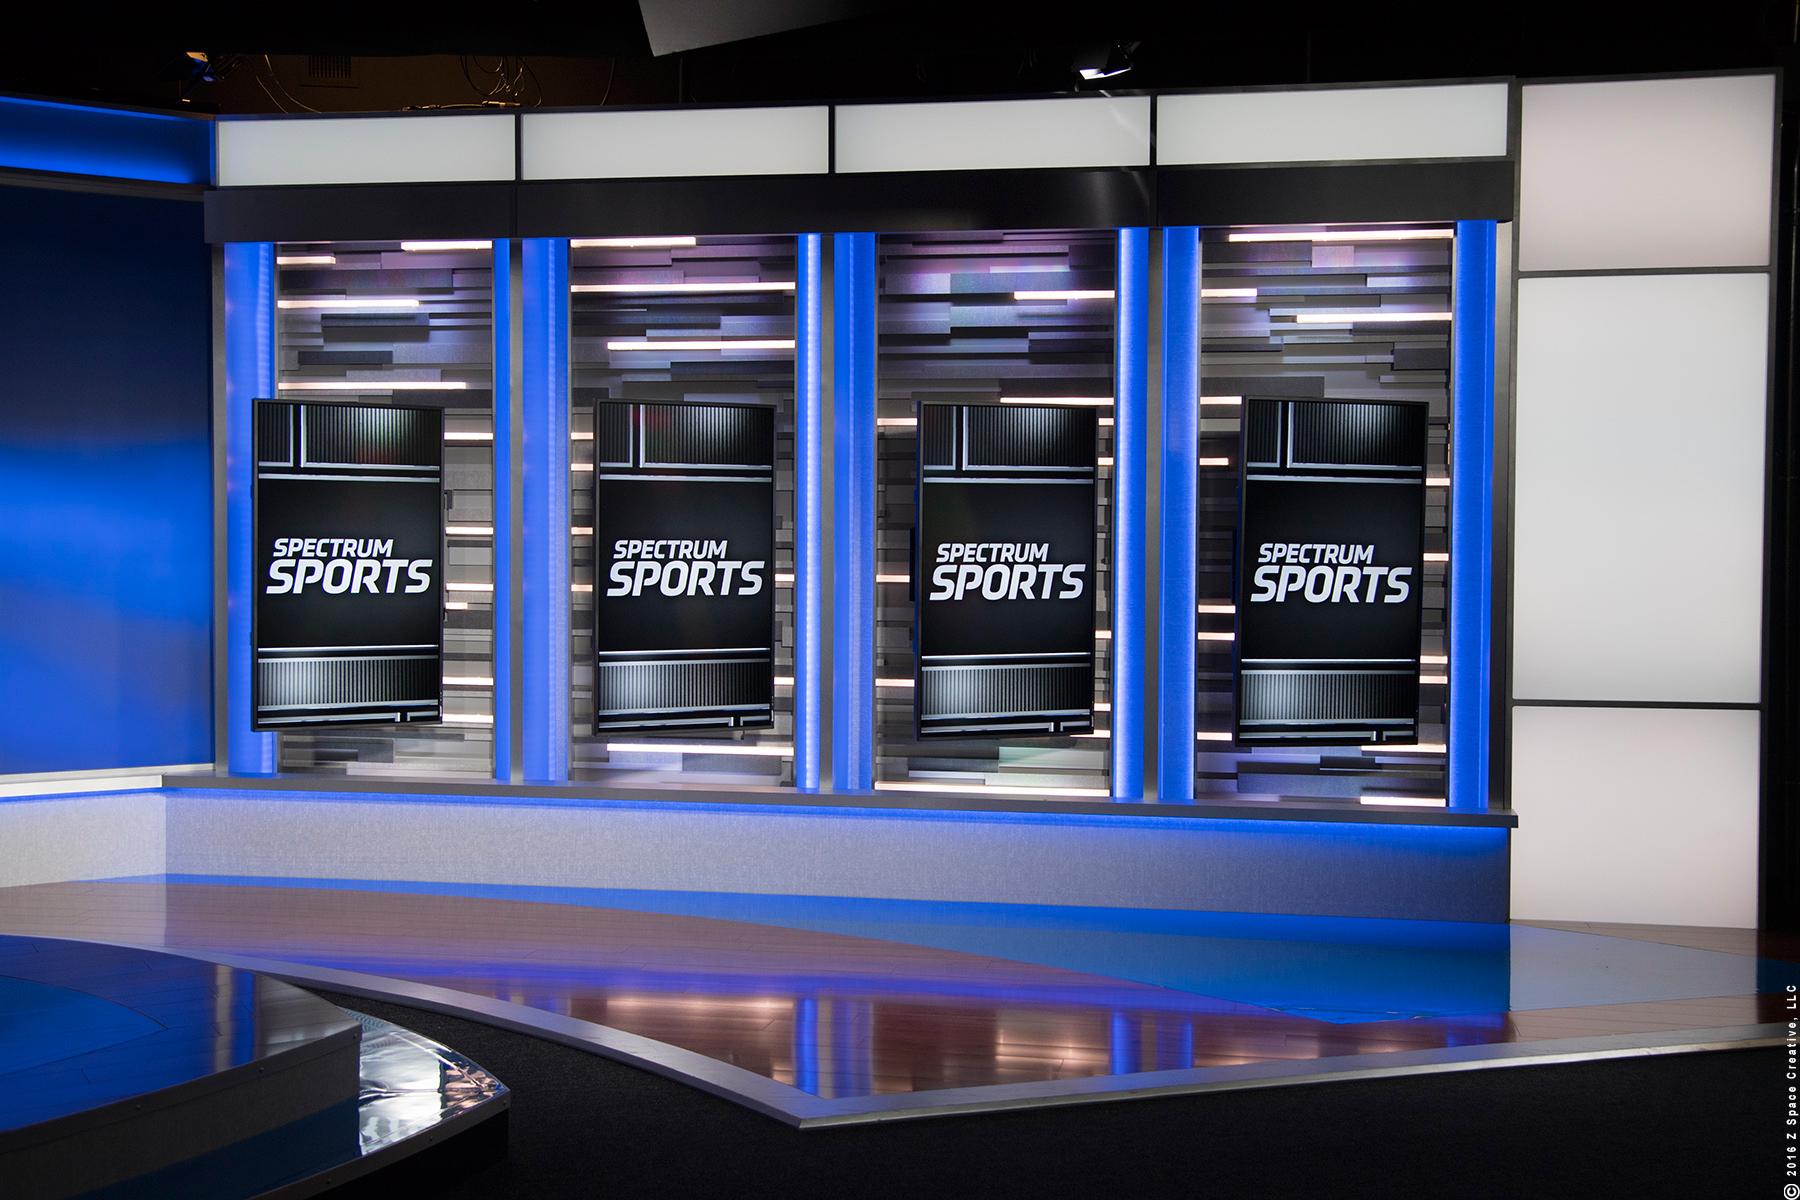 ncs_spectrum-sports-tampa-studio_0002